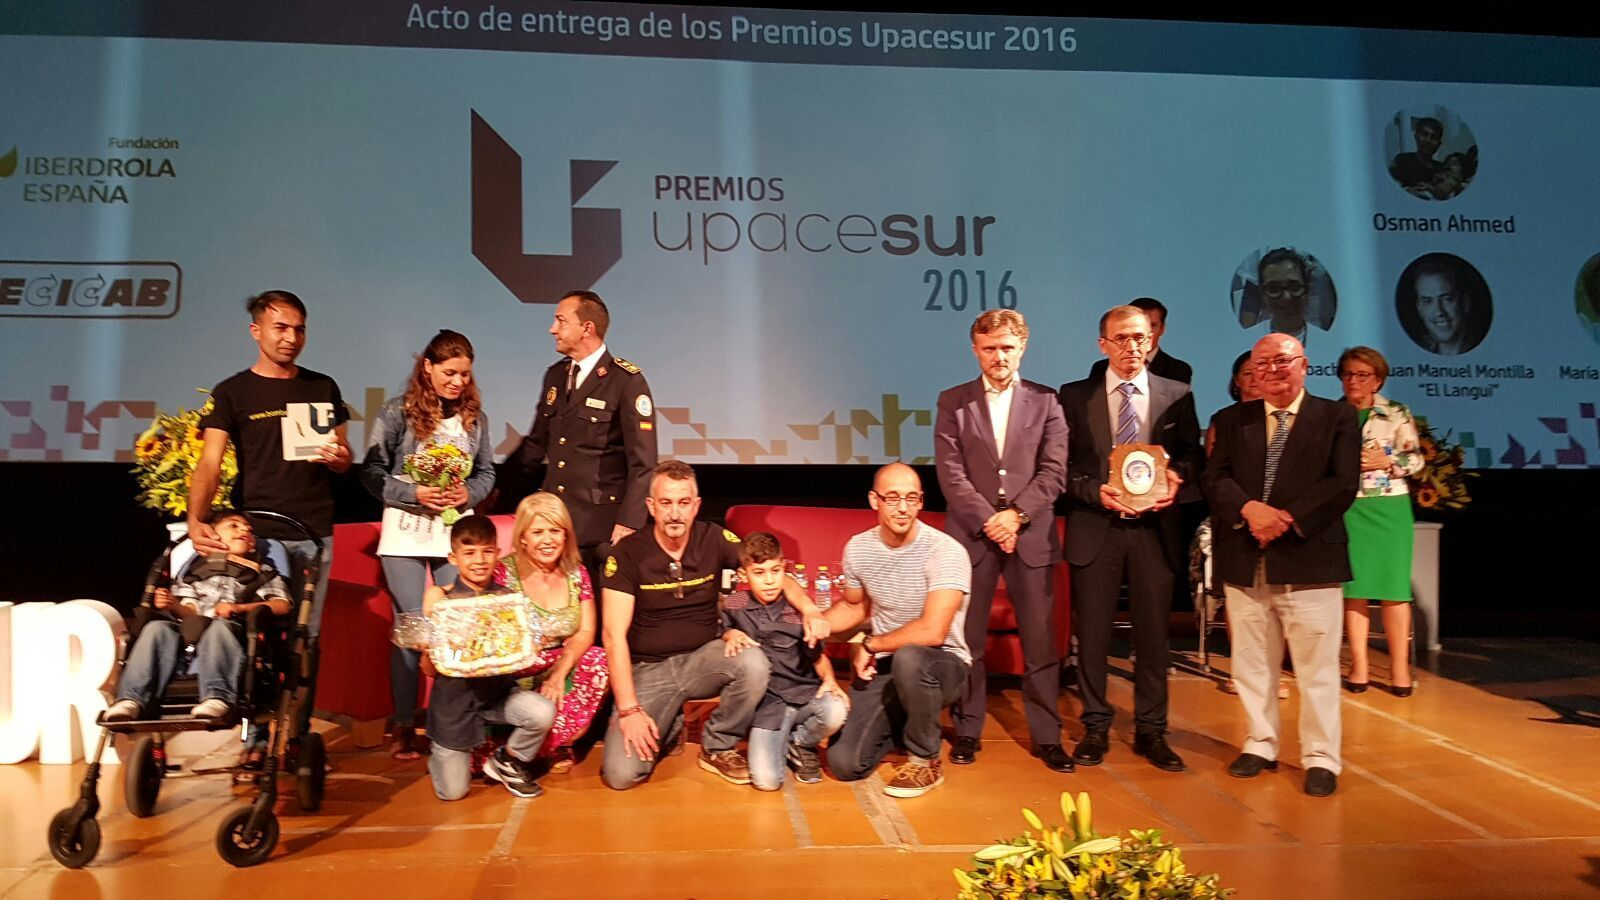 premios-upacesur-2